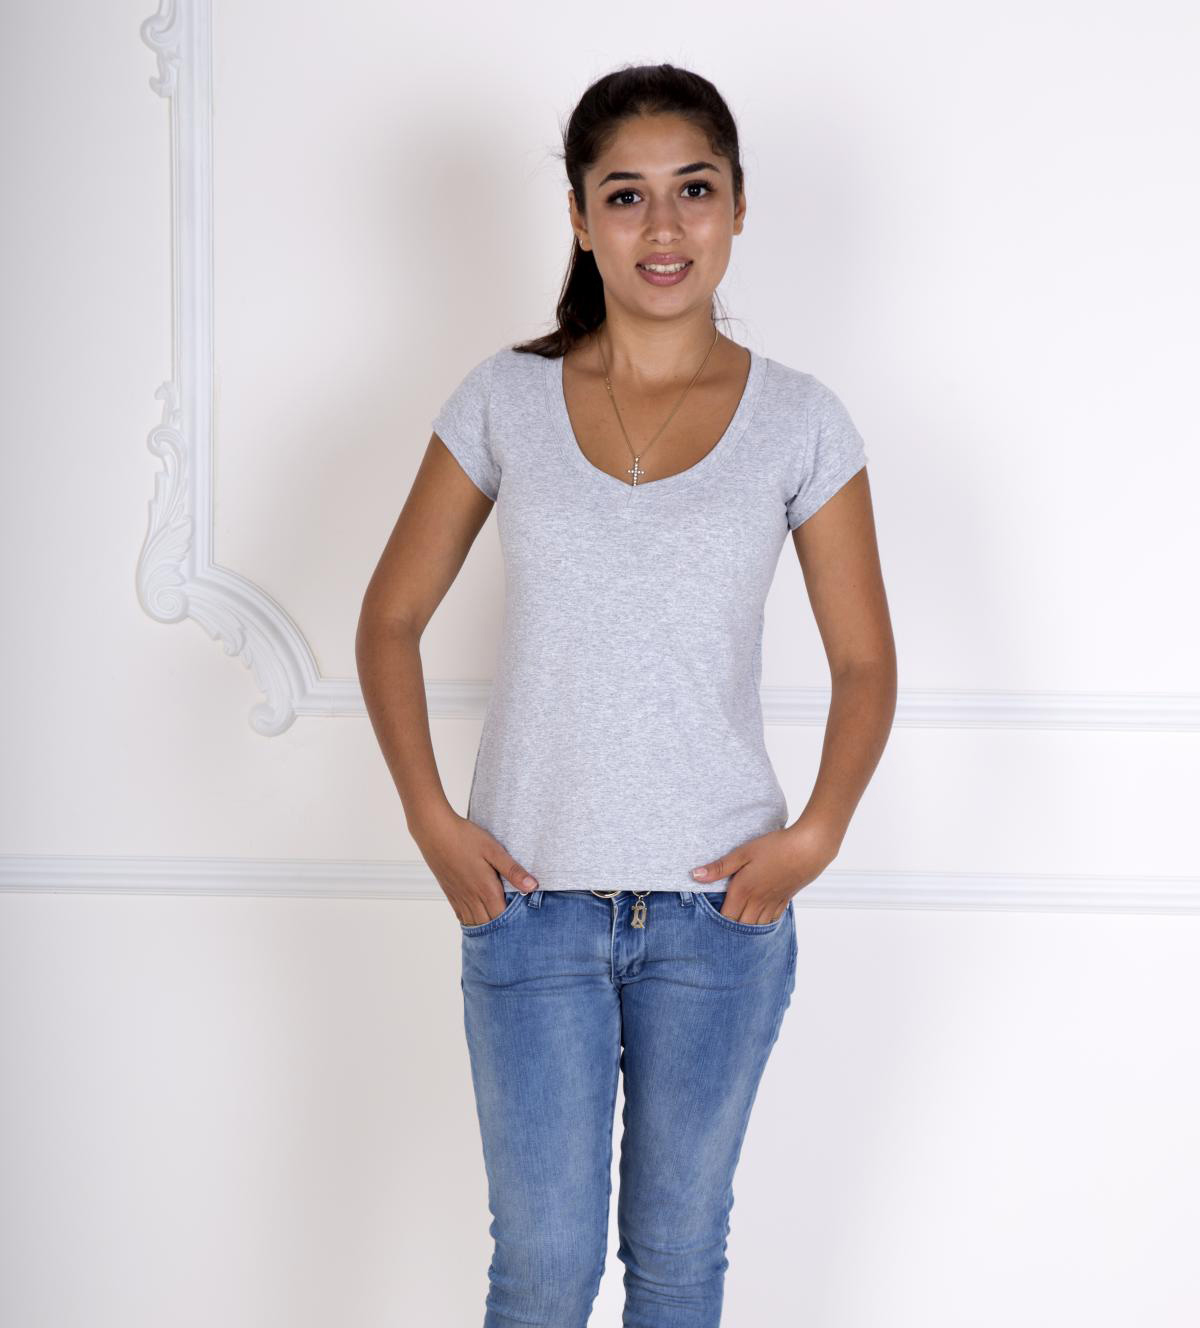 Жен. футболка  Лиза  Серый р. 58 - Женская одежда артикул: 33470